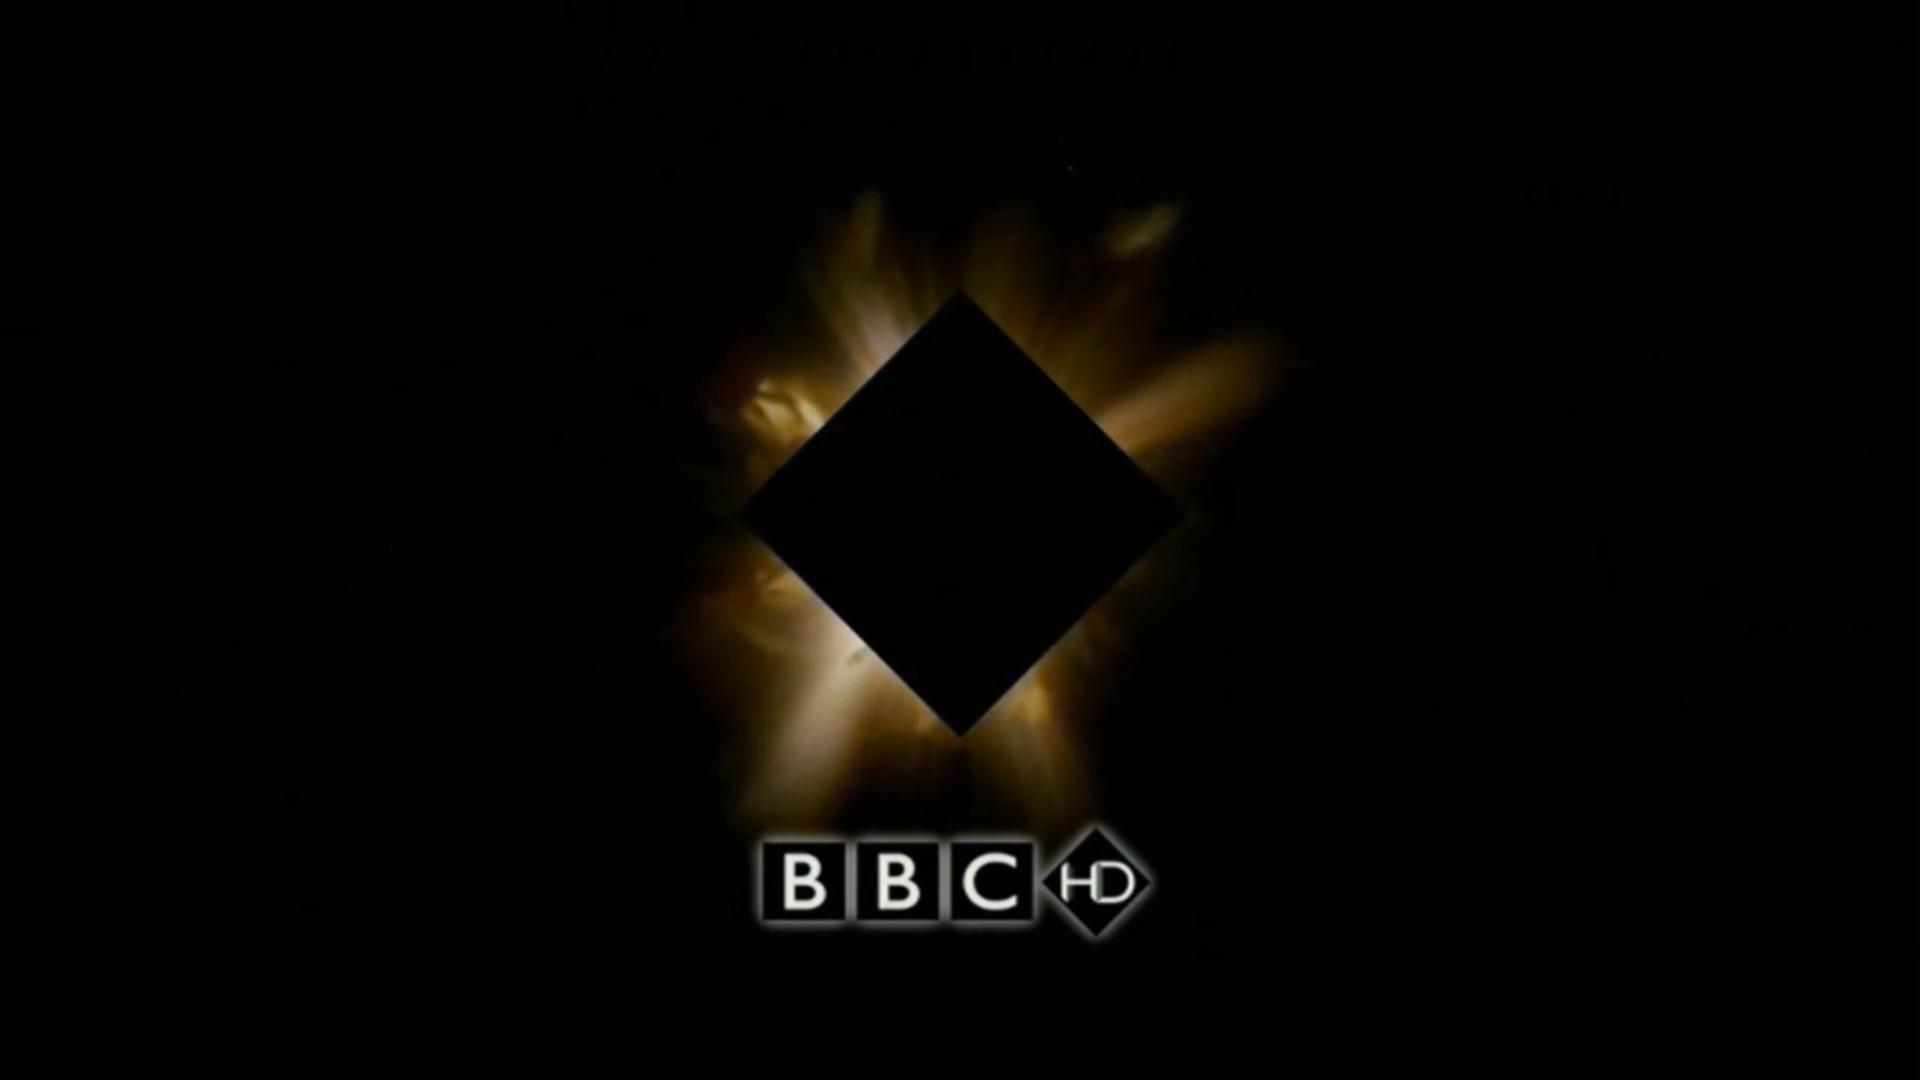 BBC HD/Idents